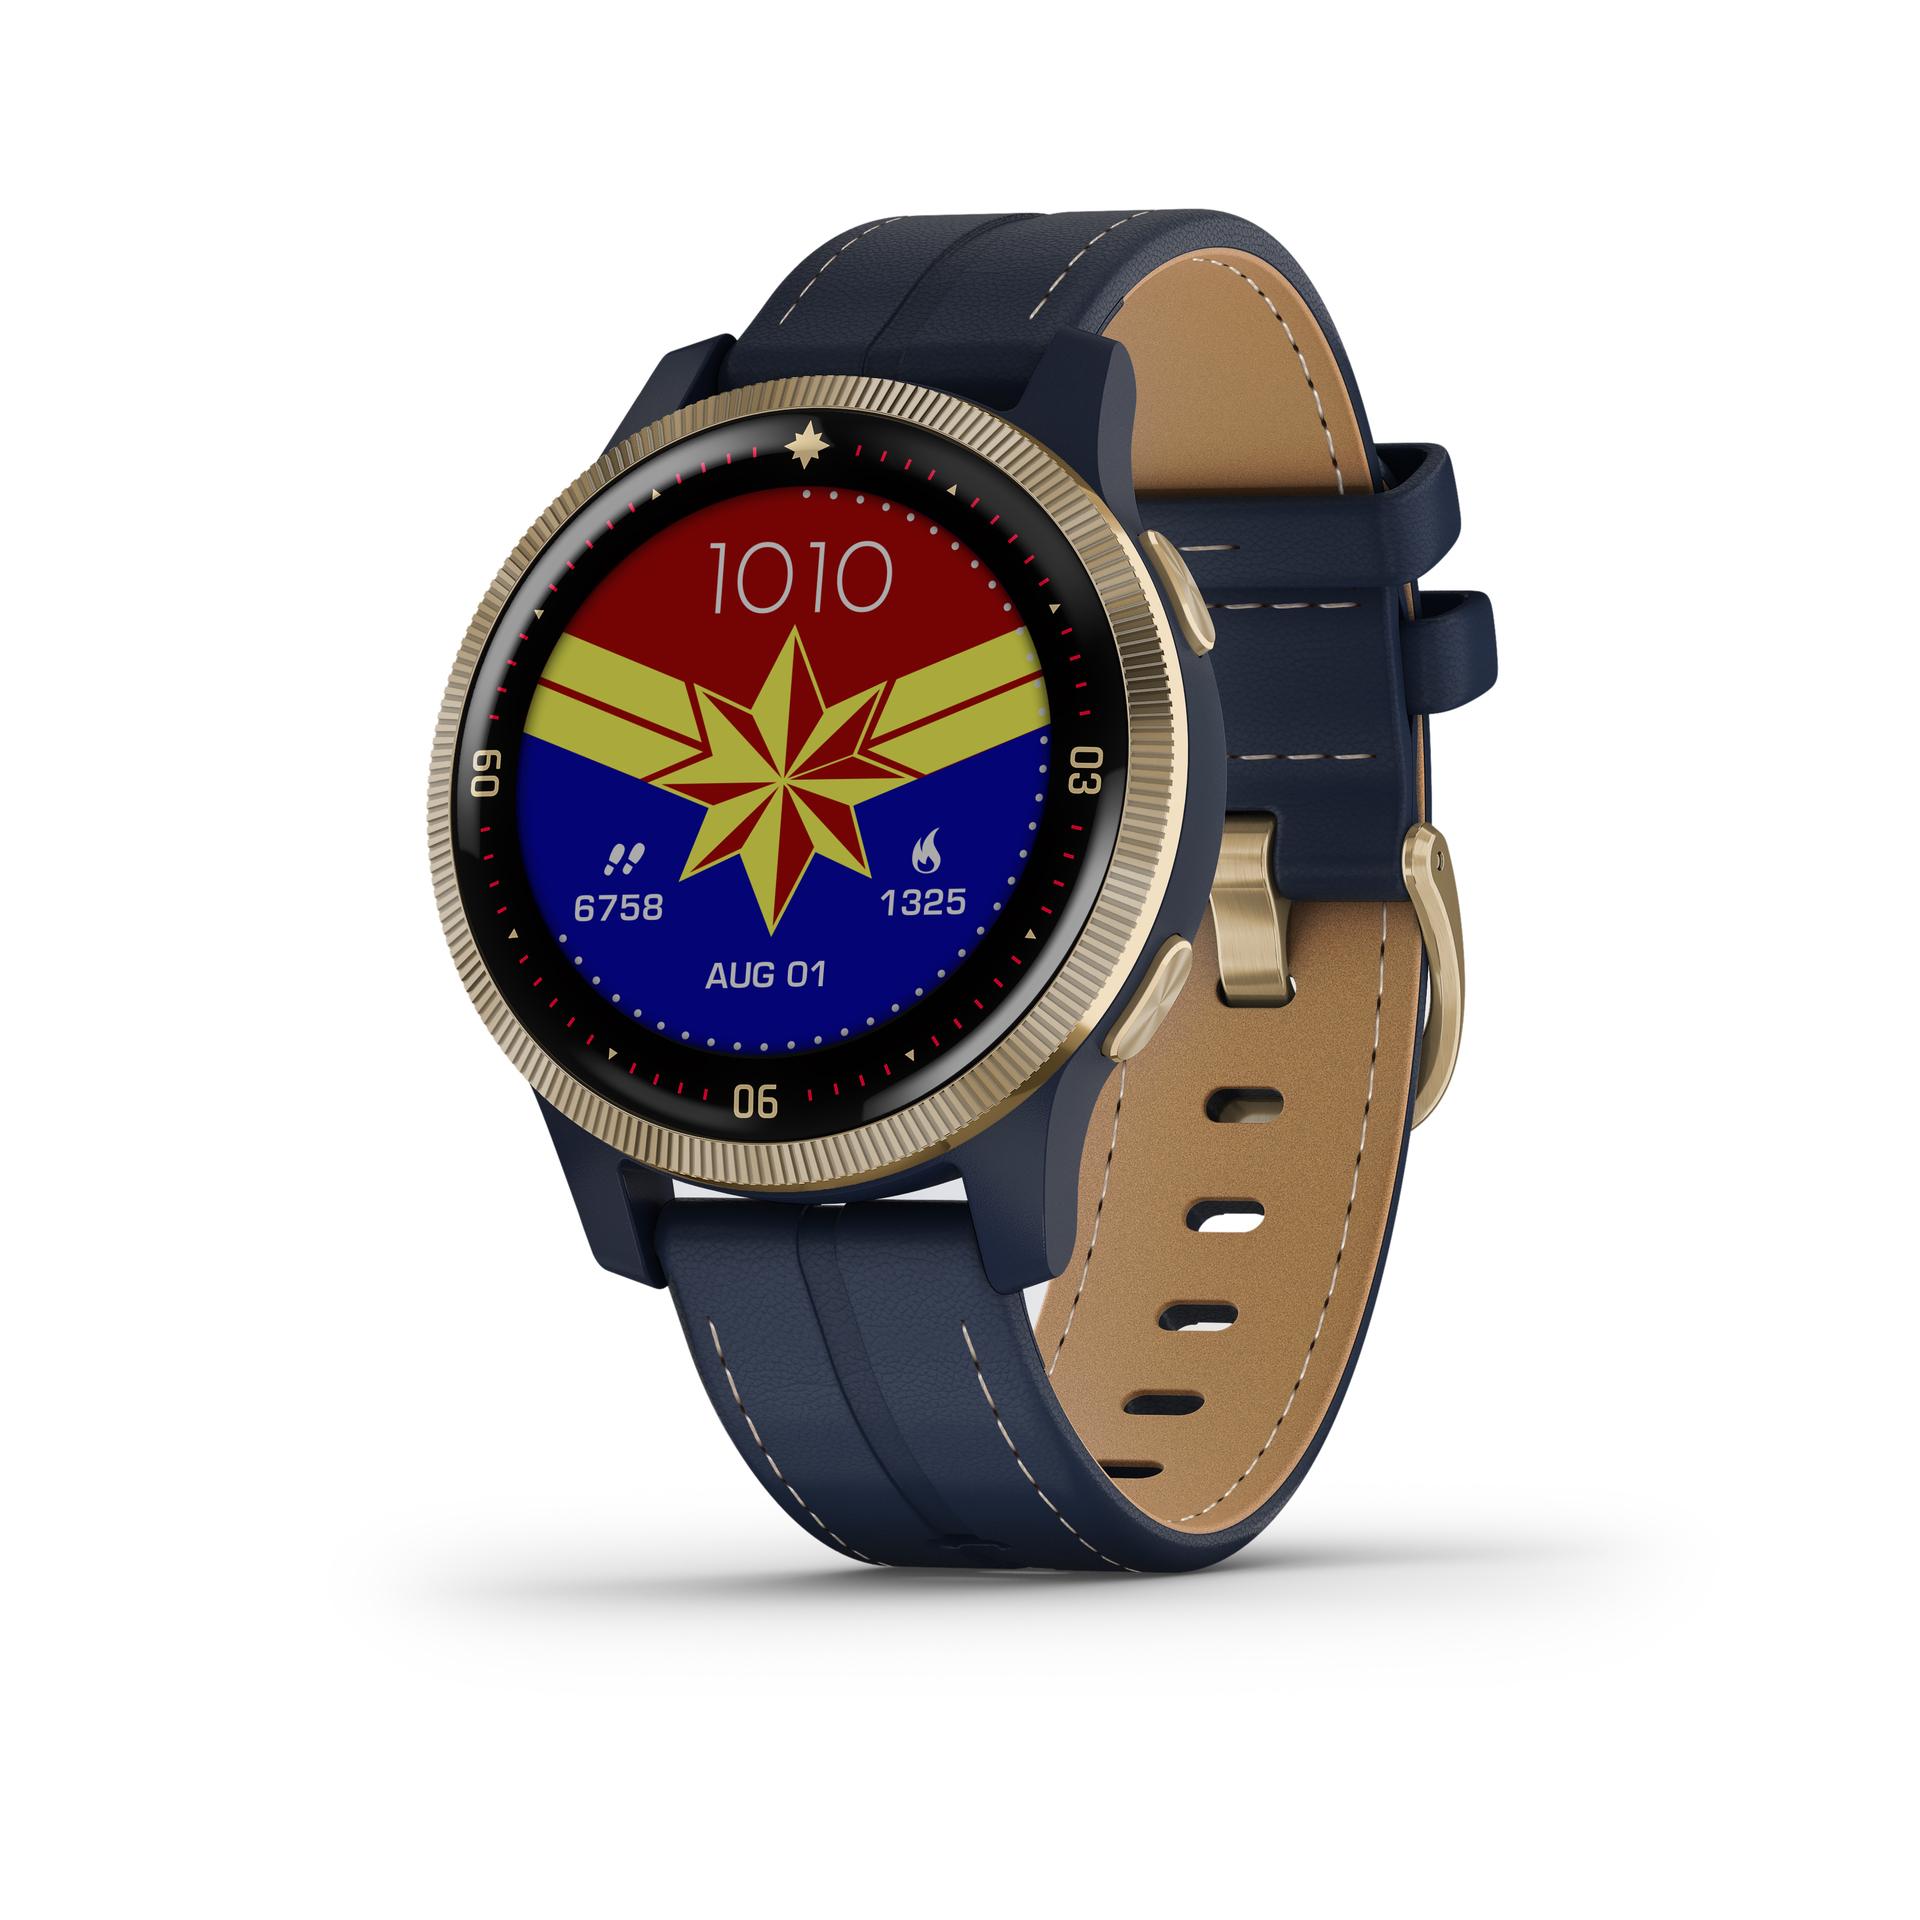 garmin legacy hero smartwatch captain marvel